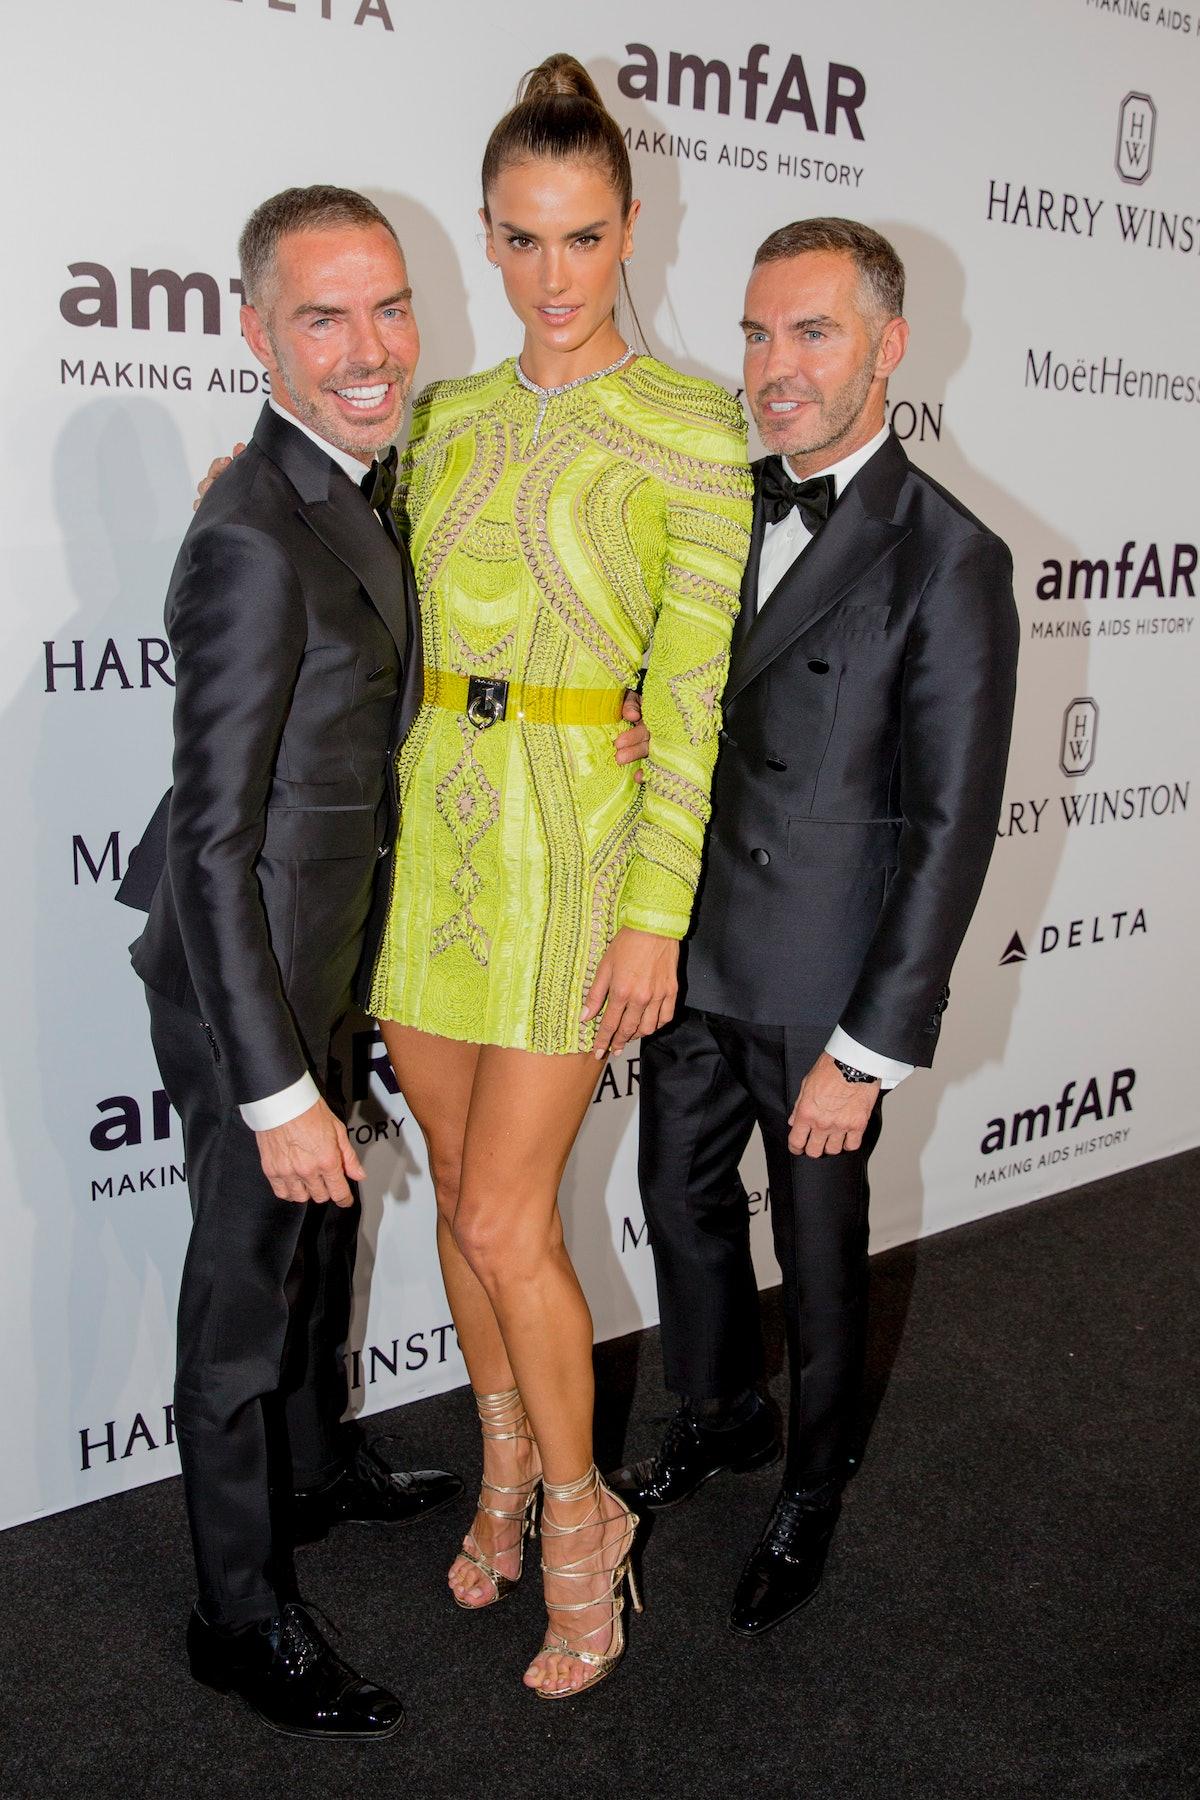 Alessandra Ambrosio with Dean and Dan Caten